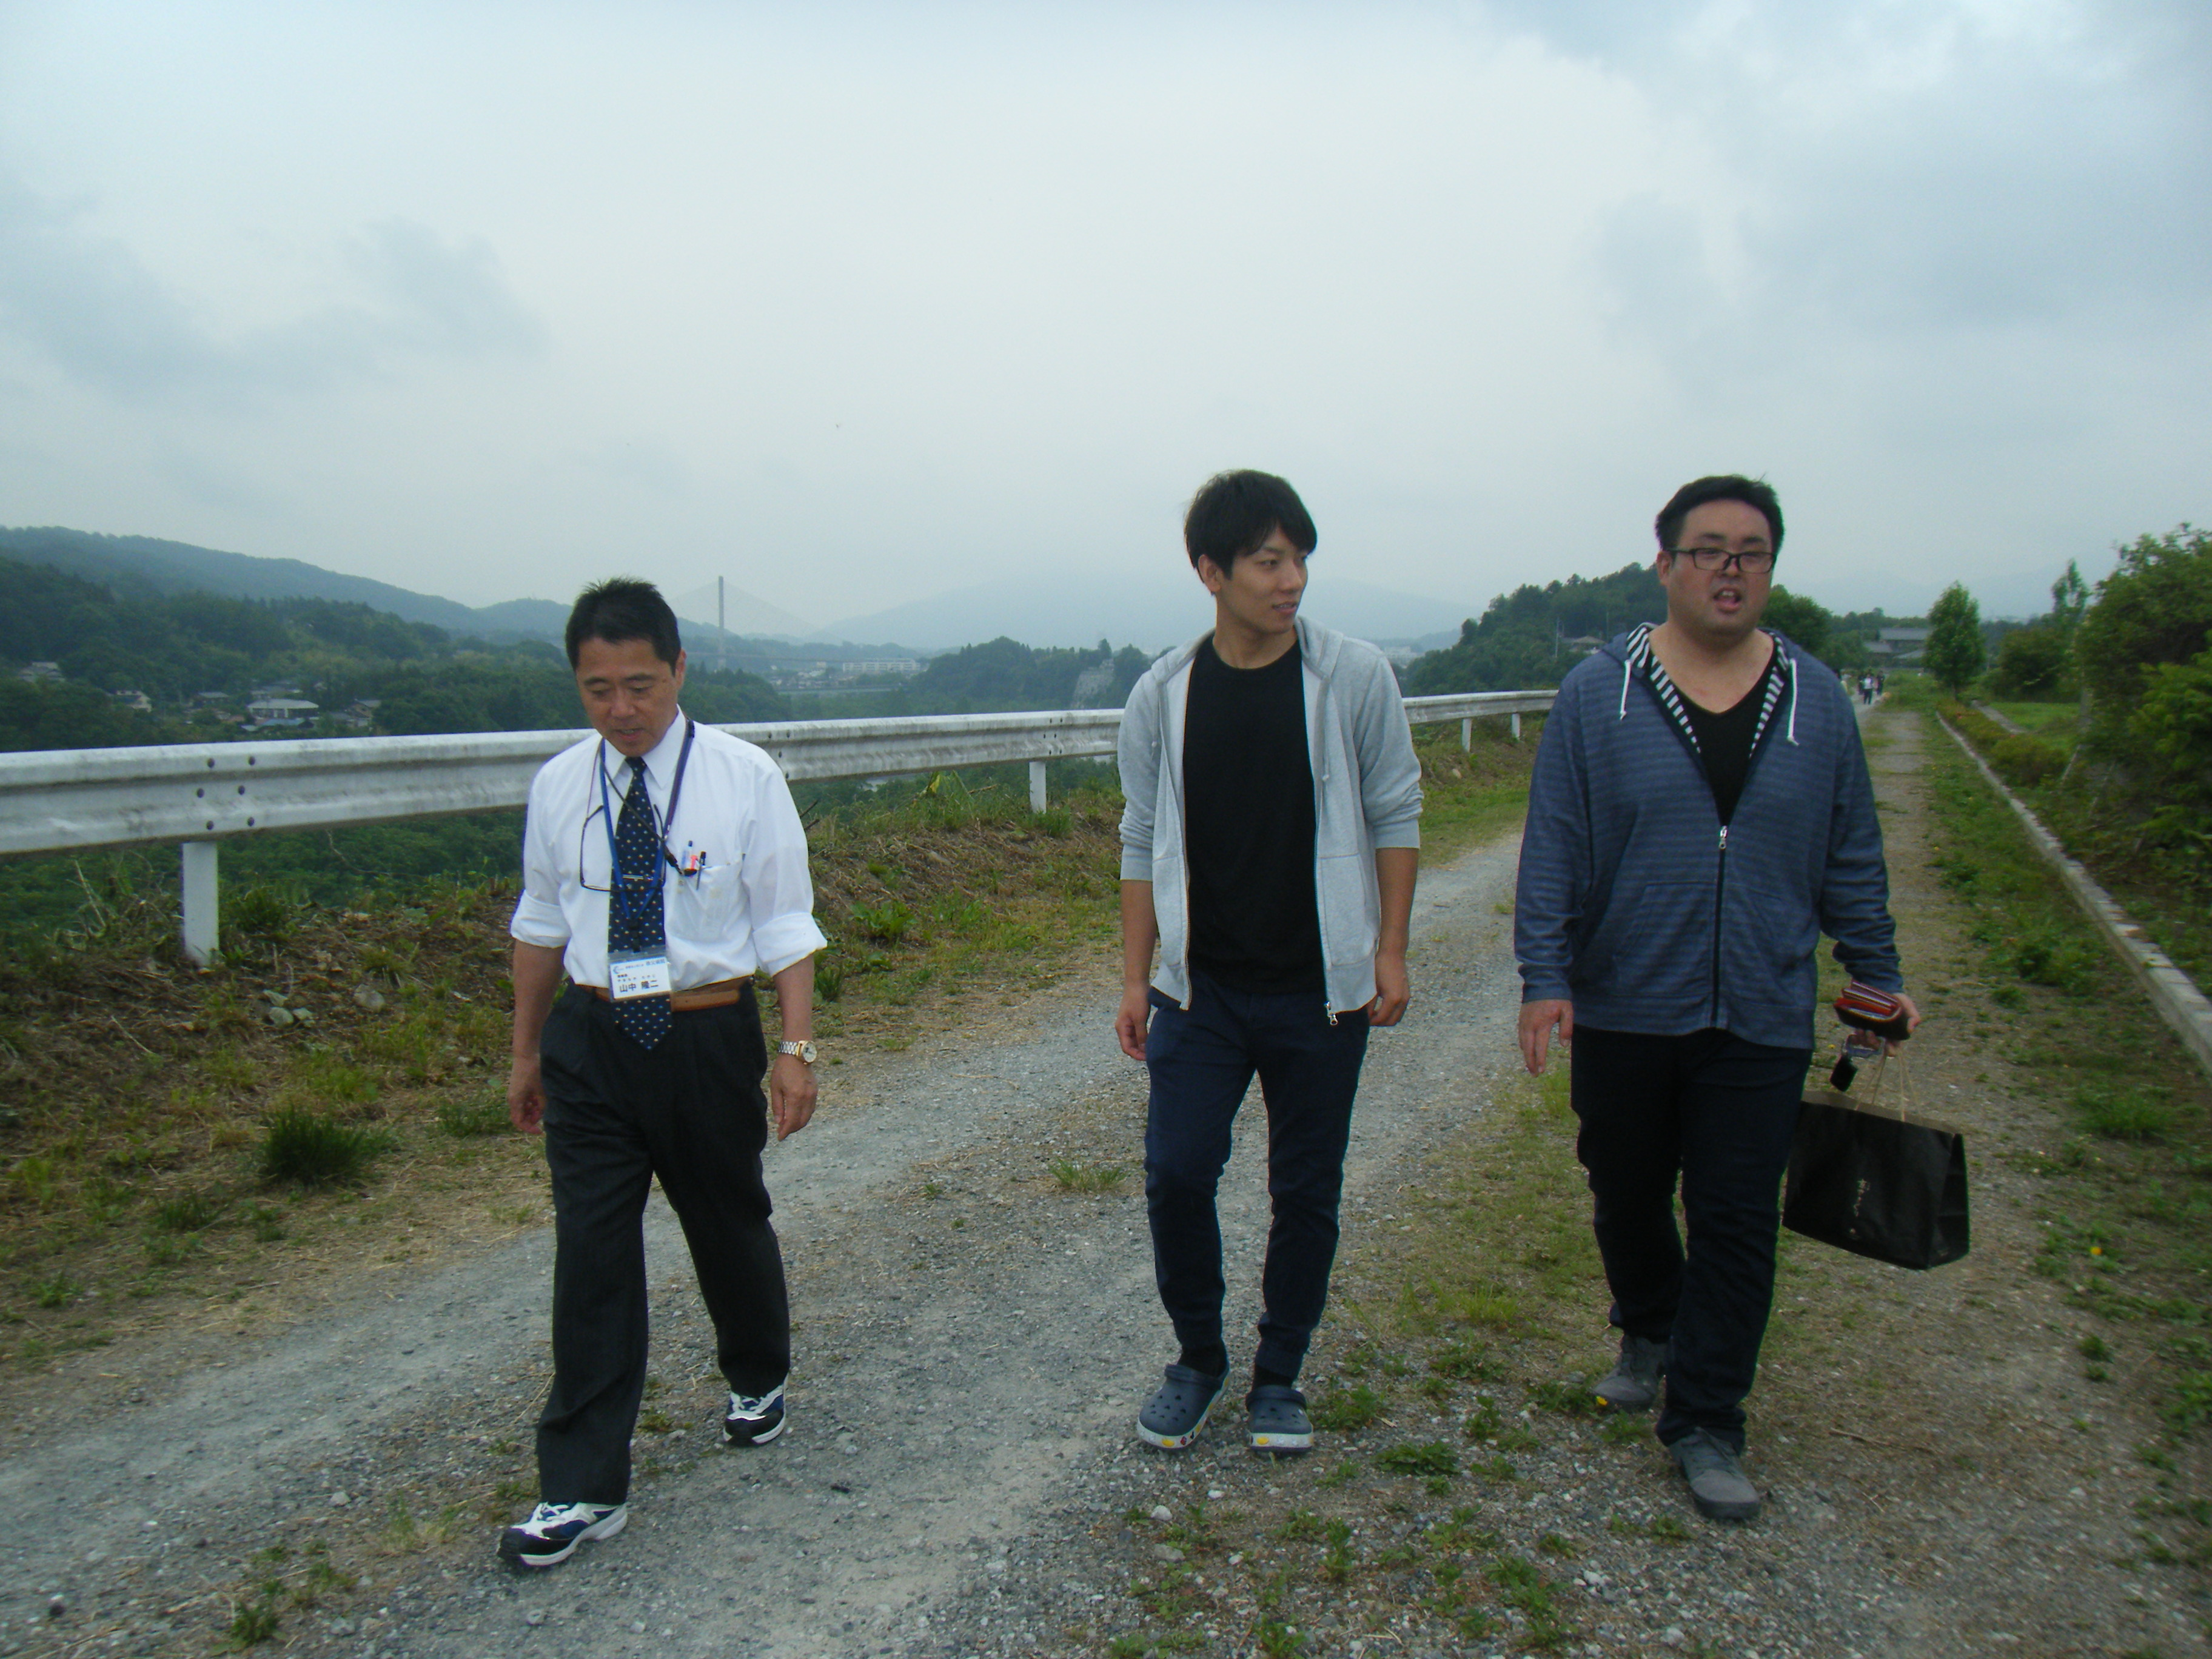 http://chichibu-med.jp/ndblog/DSCF1373.JPG